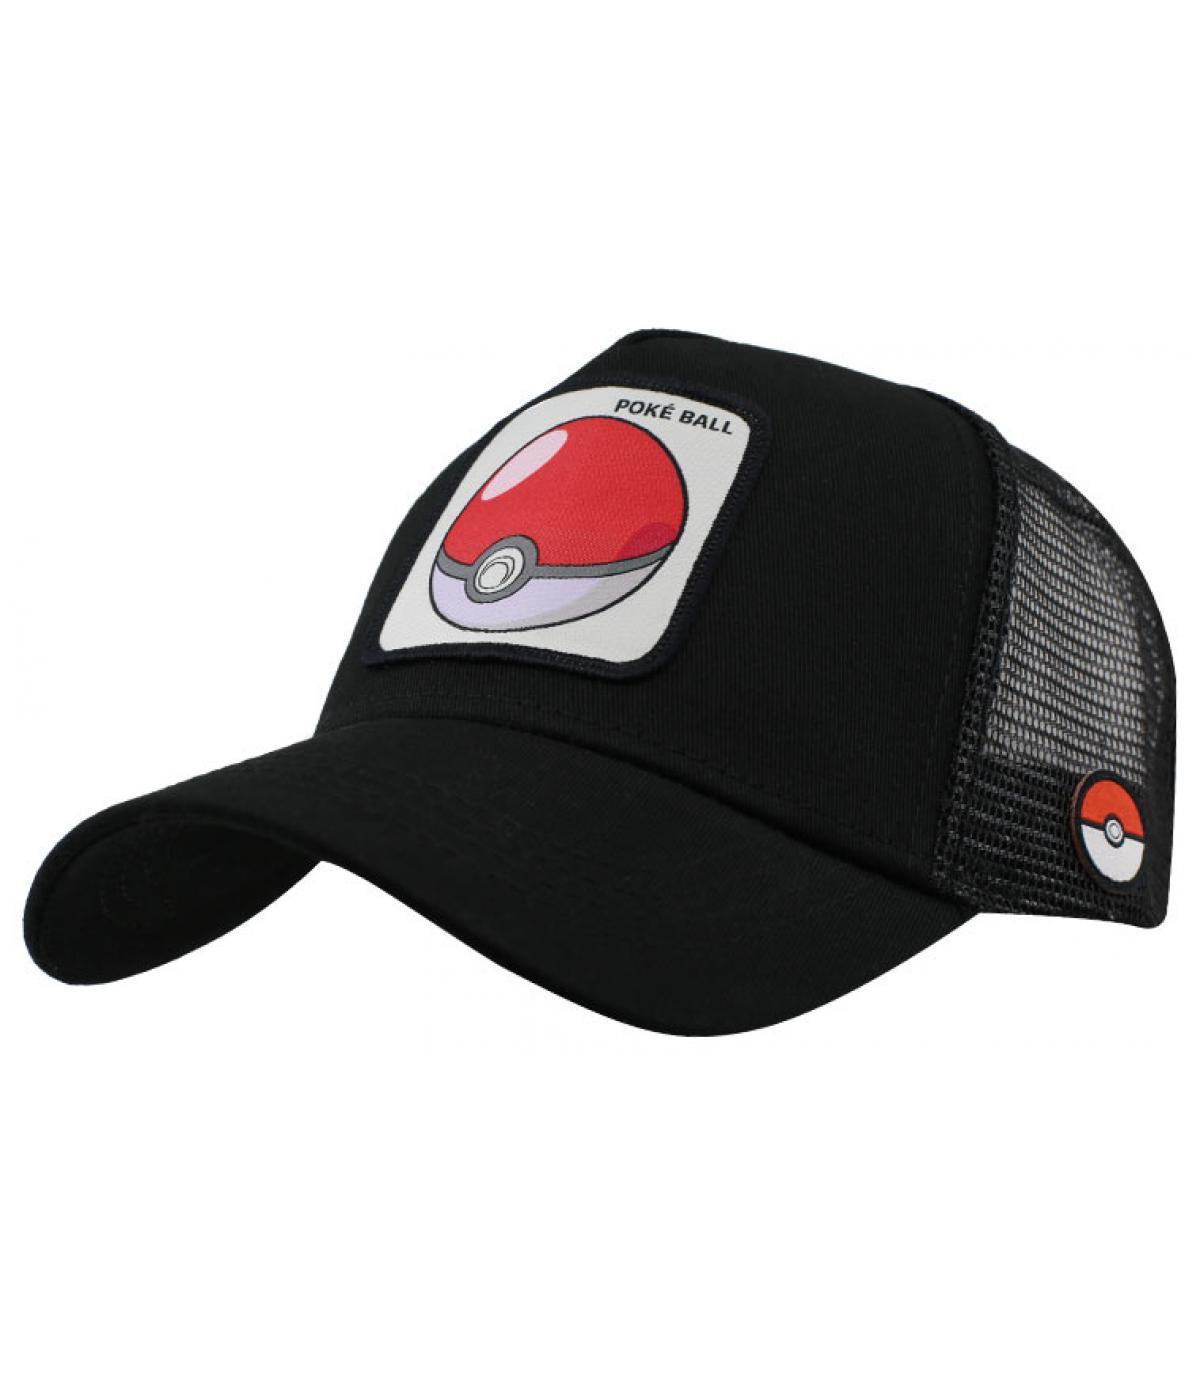 Détails Trucker Pokemon Poké Ball - image 2